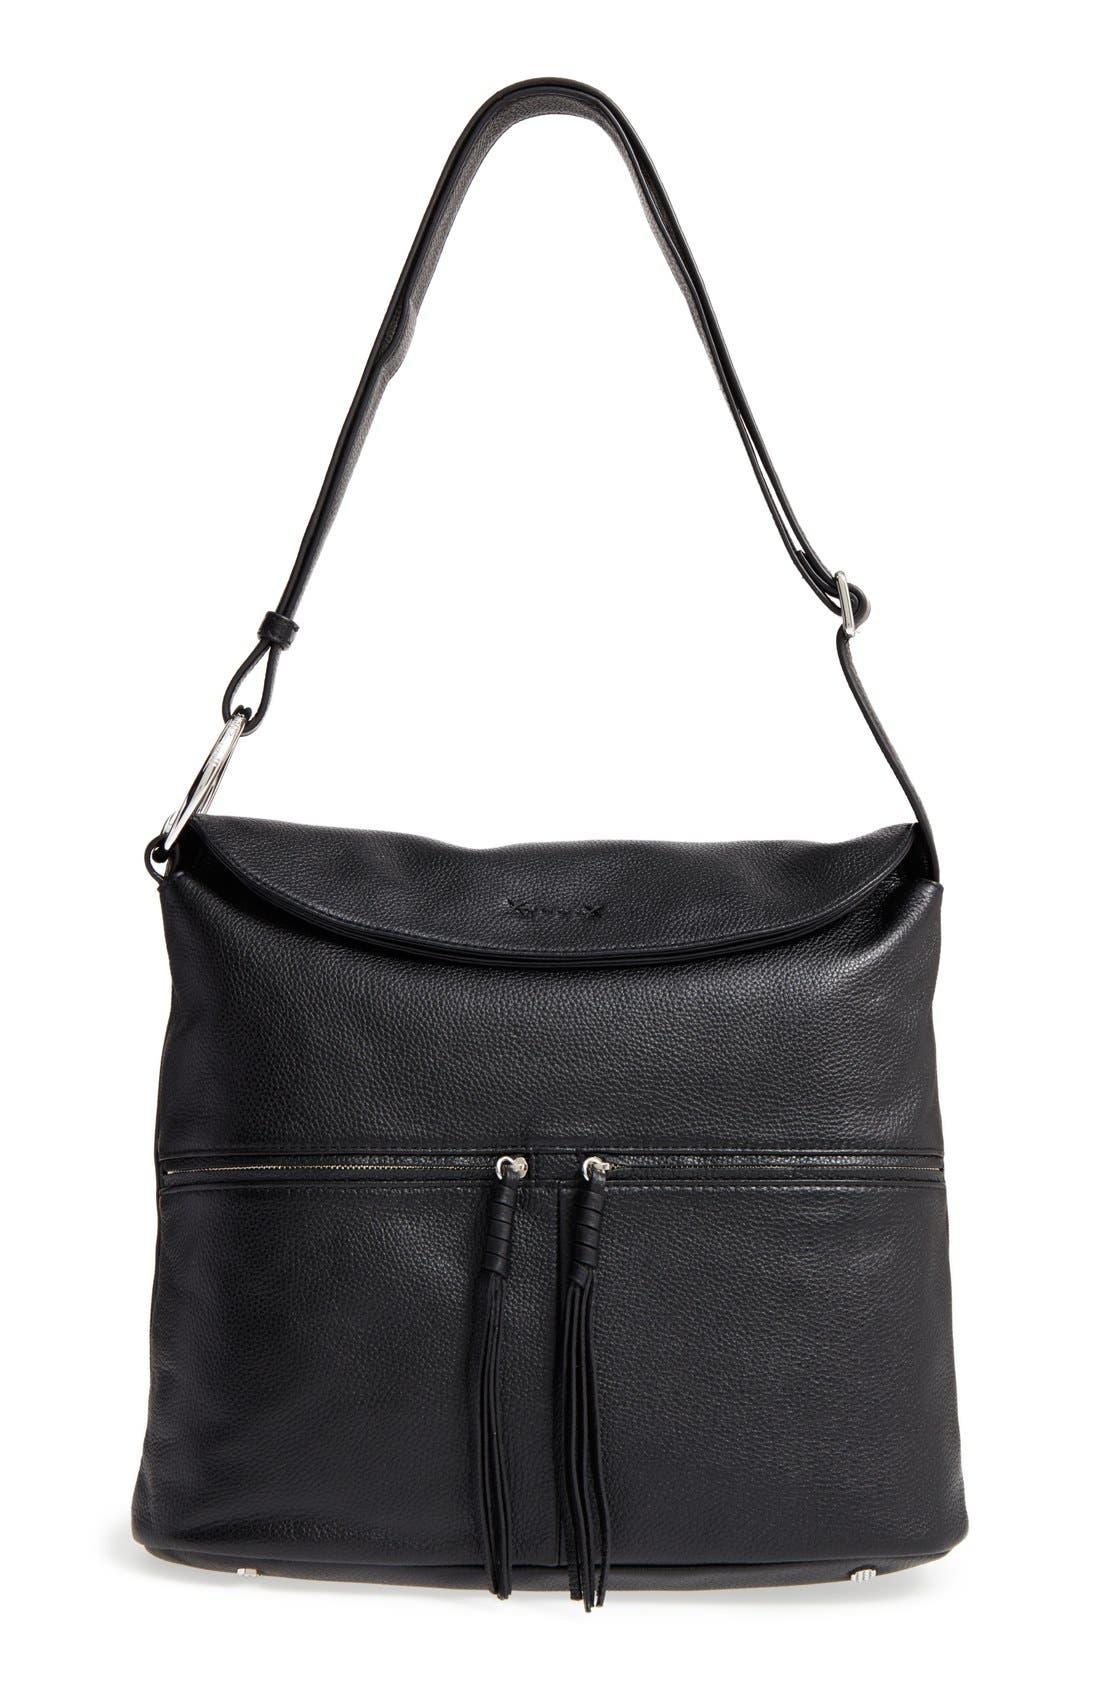 Finley Leather Hobo Bag,                         Main,                         color, Black